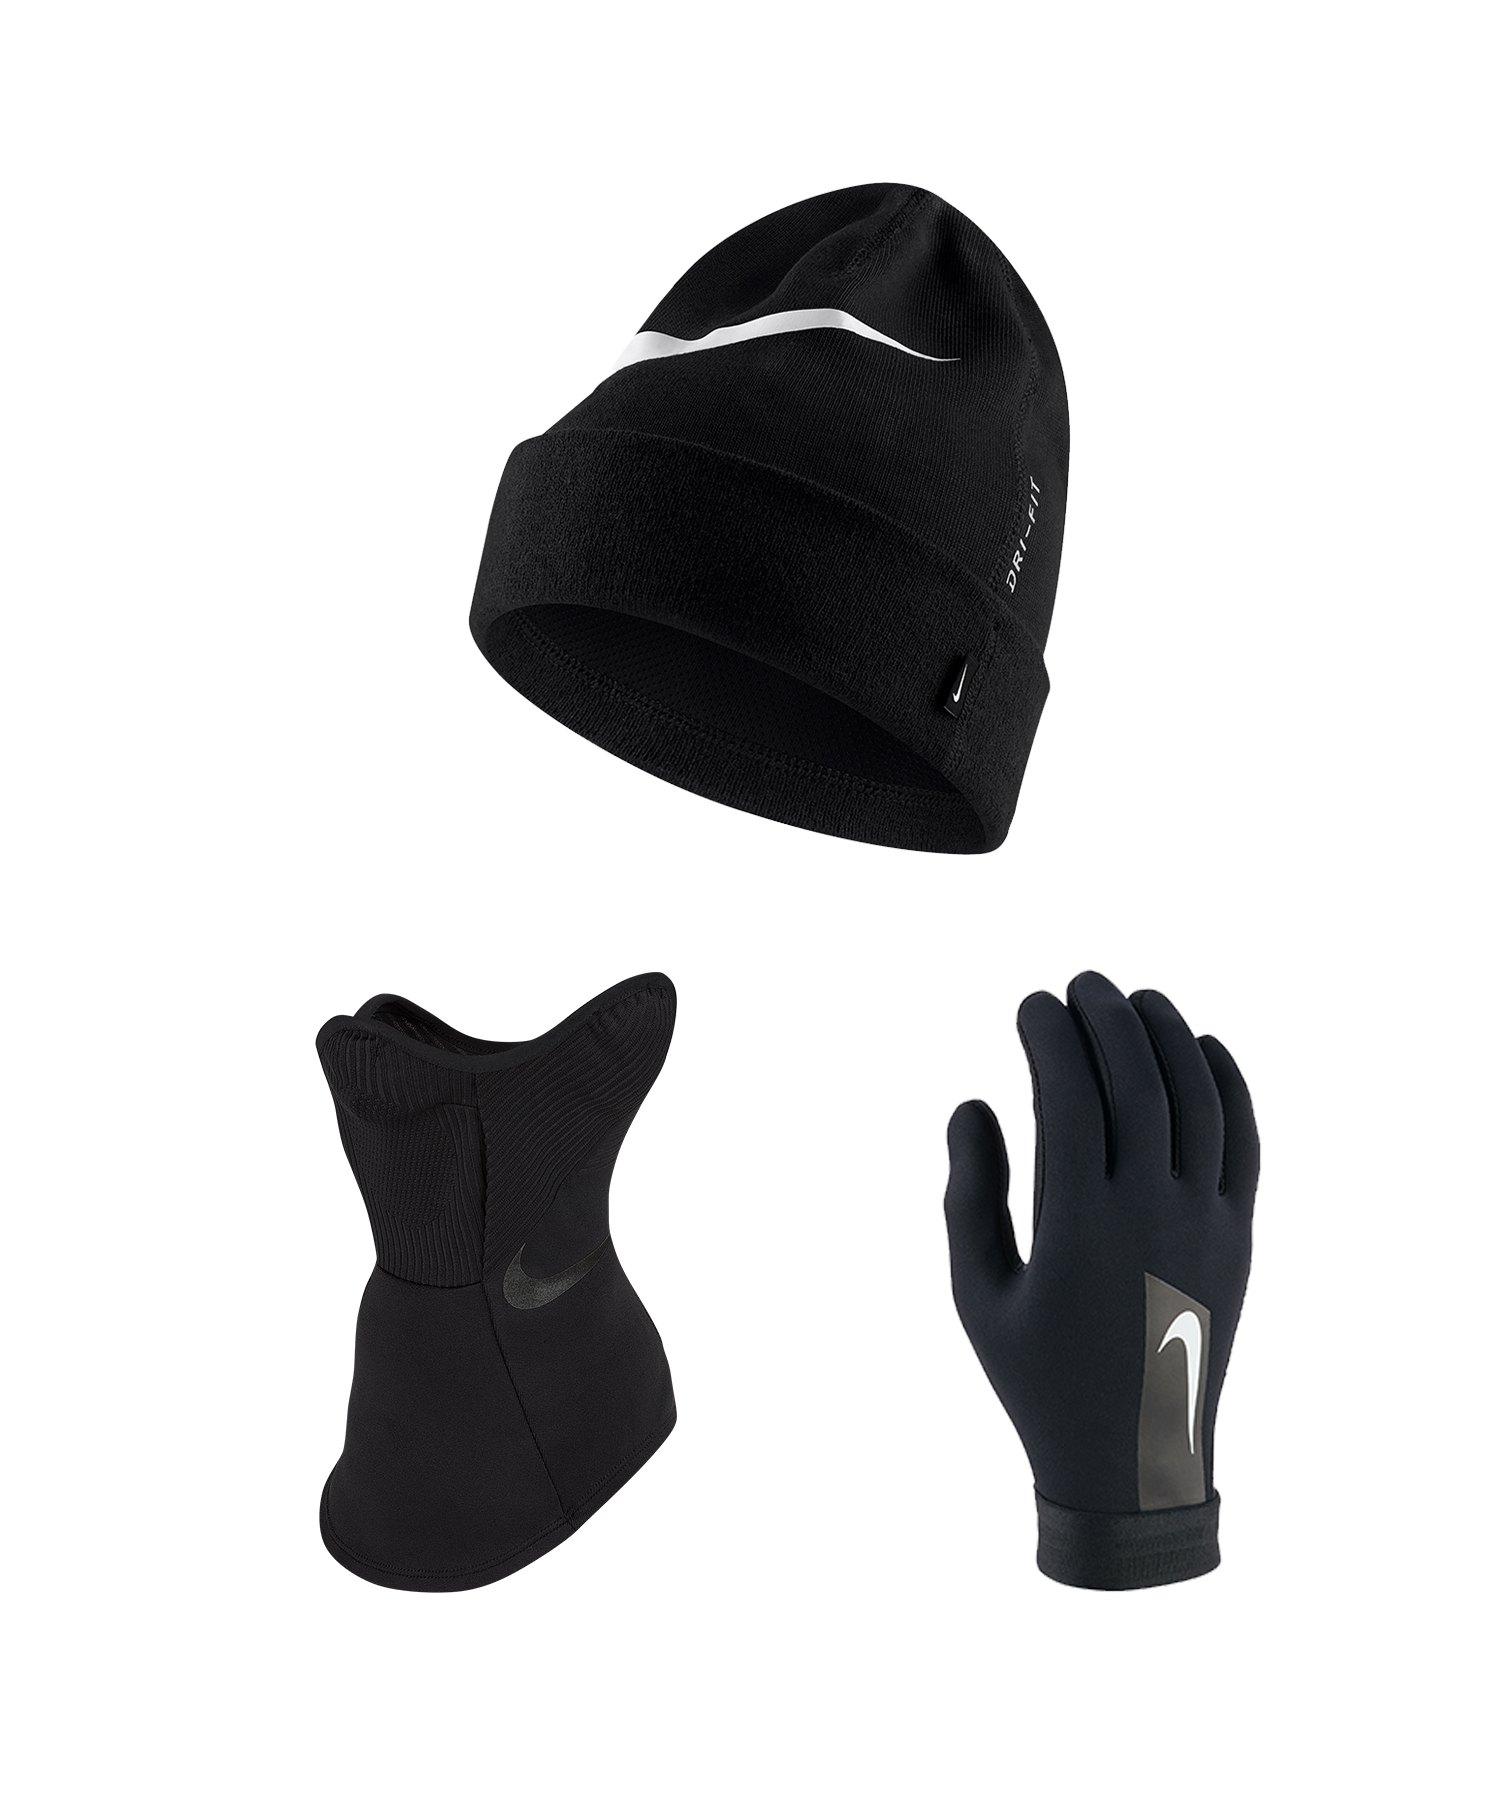 Nike Vapor 3er Winter Set Schwarz F010 - schwarz